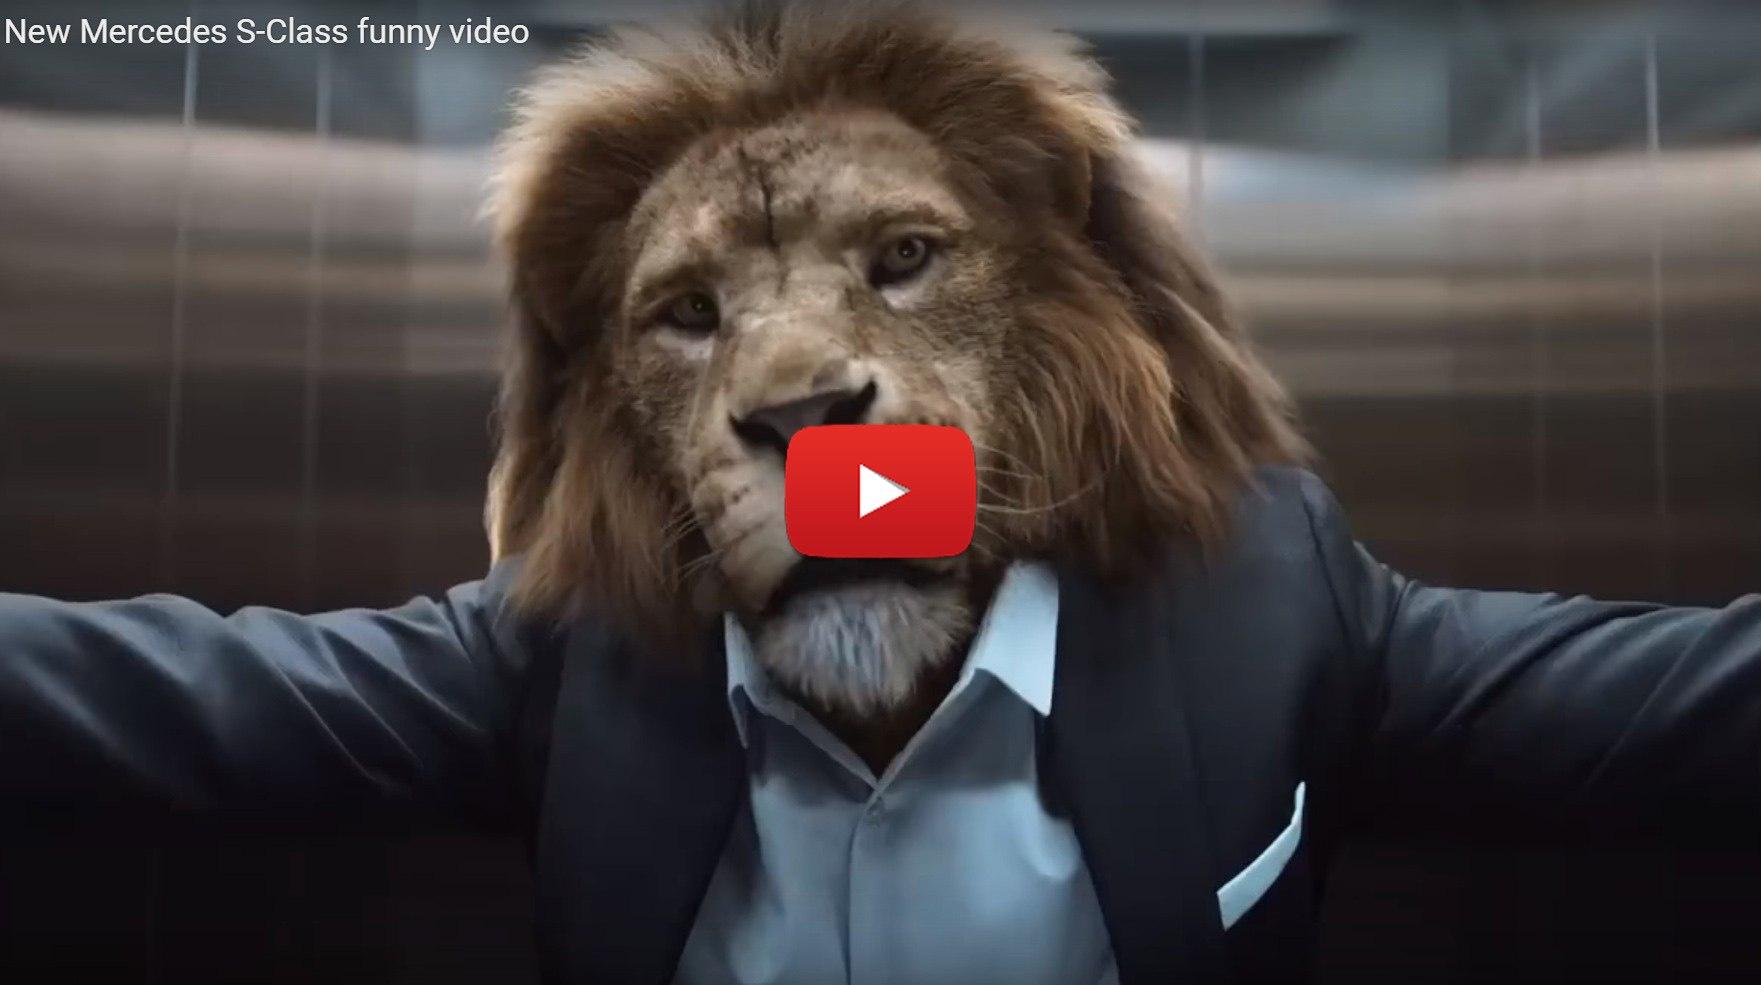 hMGXT7t39SQ - Реклама Mercedes со львом: мило и прикольно